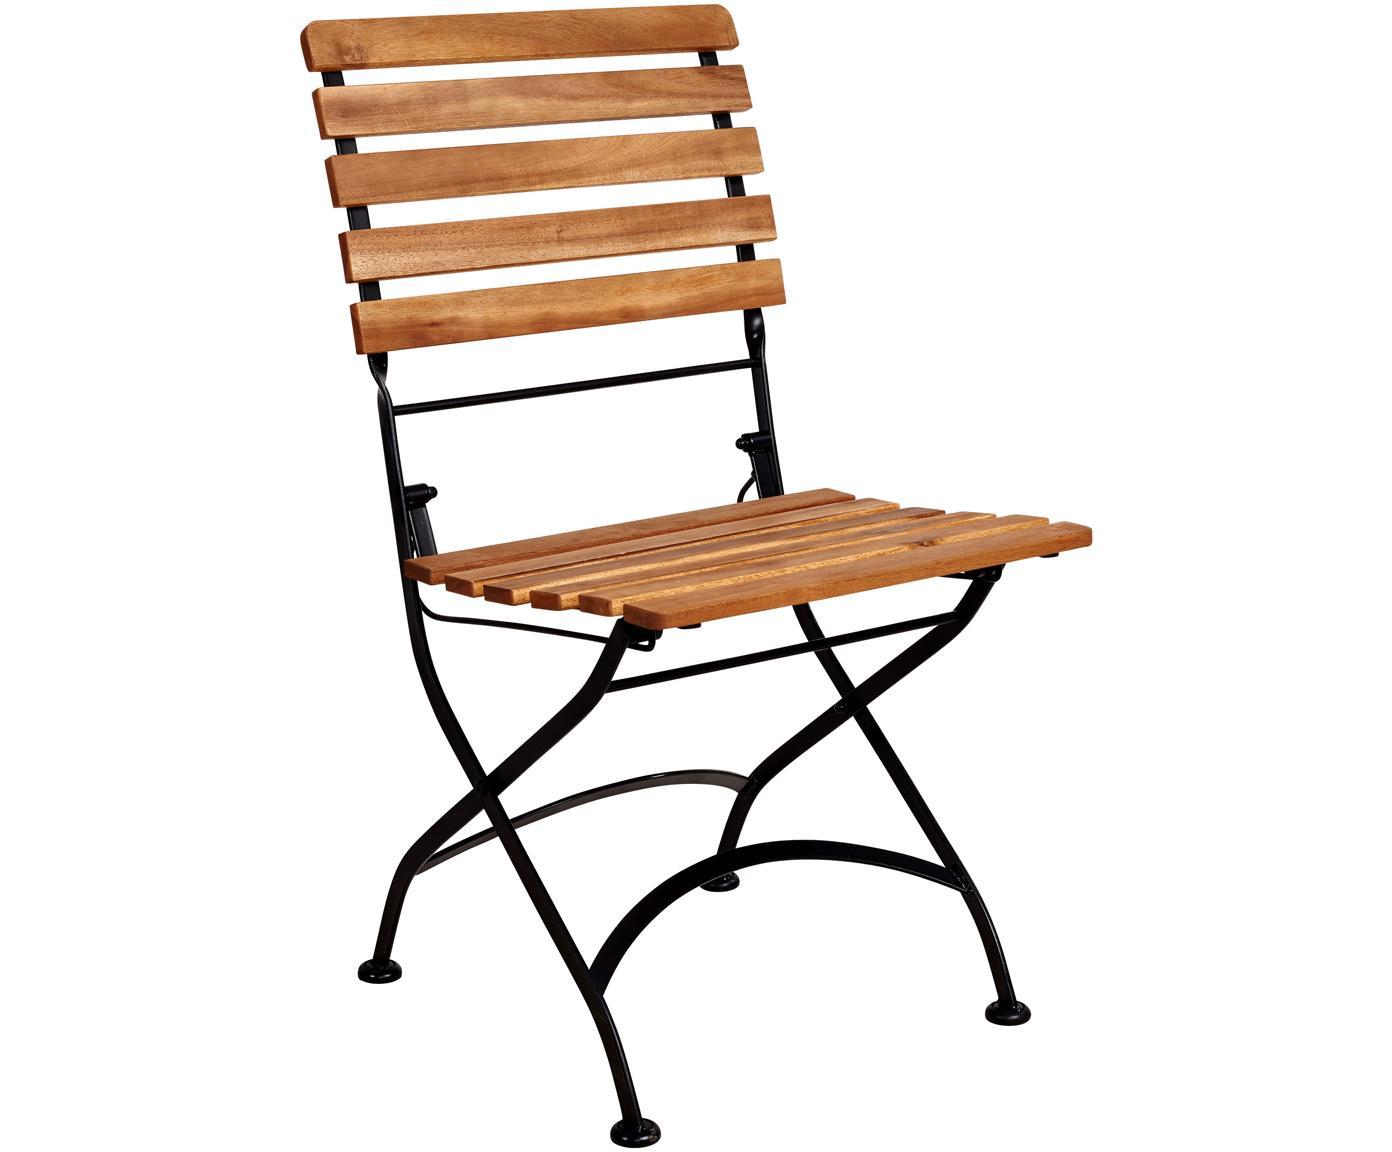 Sillas plegables de exterior Parklife, 2uds., Asiento: madera de acacia aceitada, Estructura: metal galvanizado con pin, Negro, madera de acacia, An 47x F 54 cm